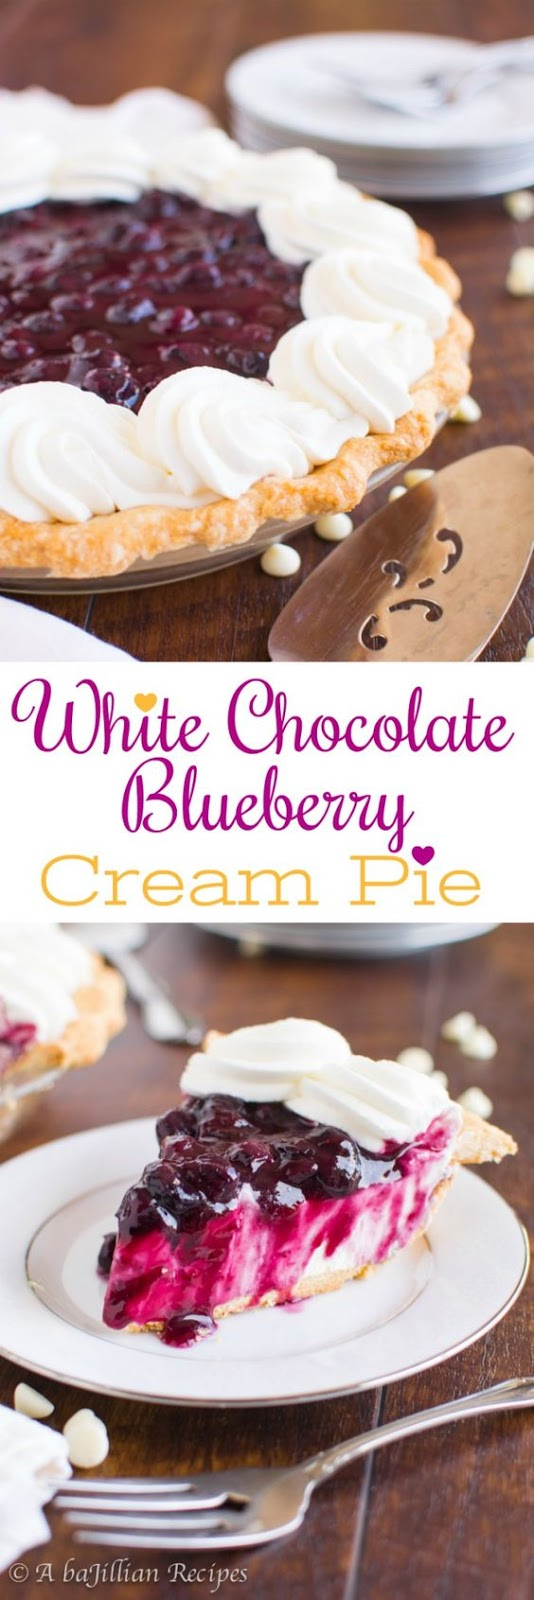 WHITE CHOCOLATE BLUEBERRY CREAM PIE RECIPES